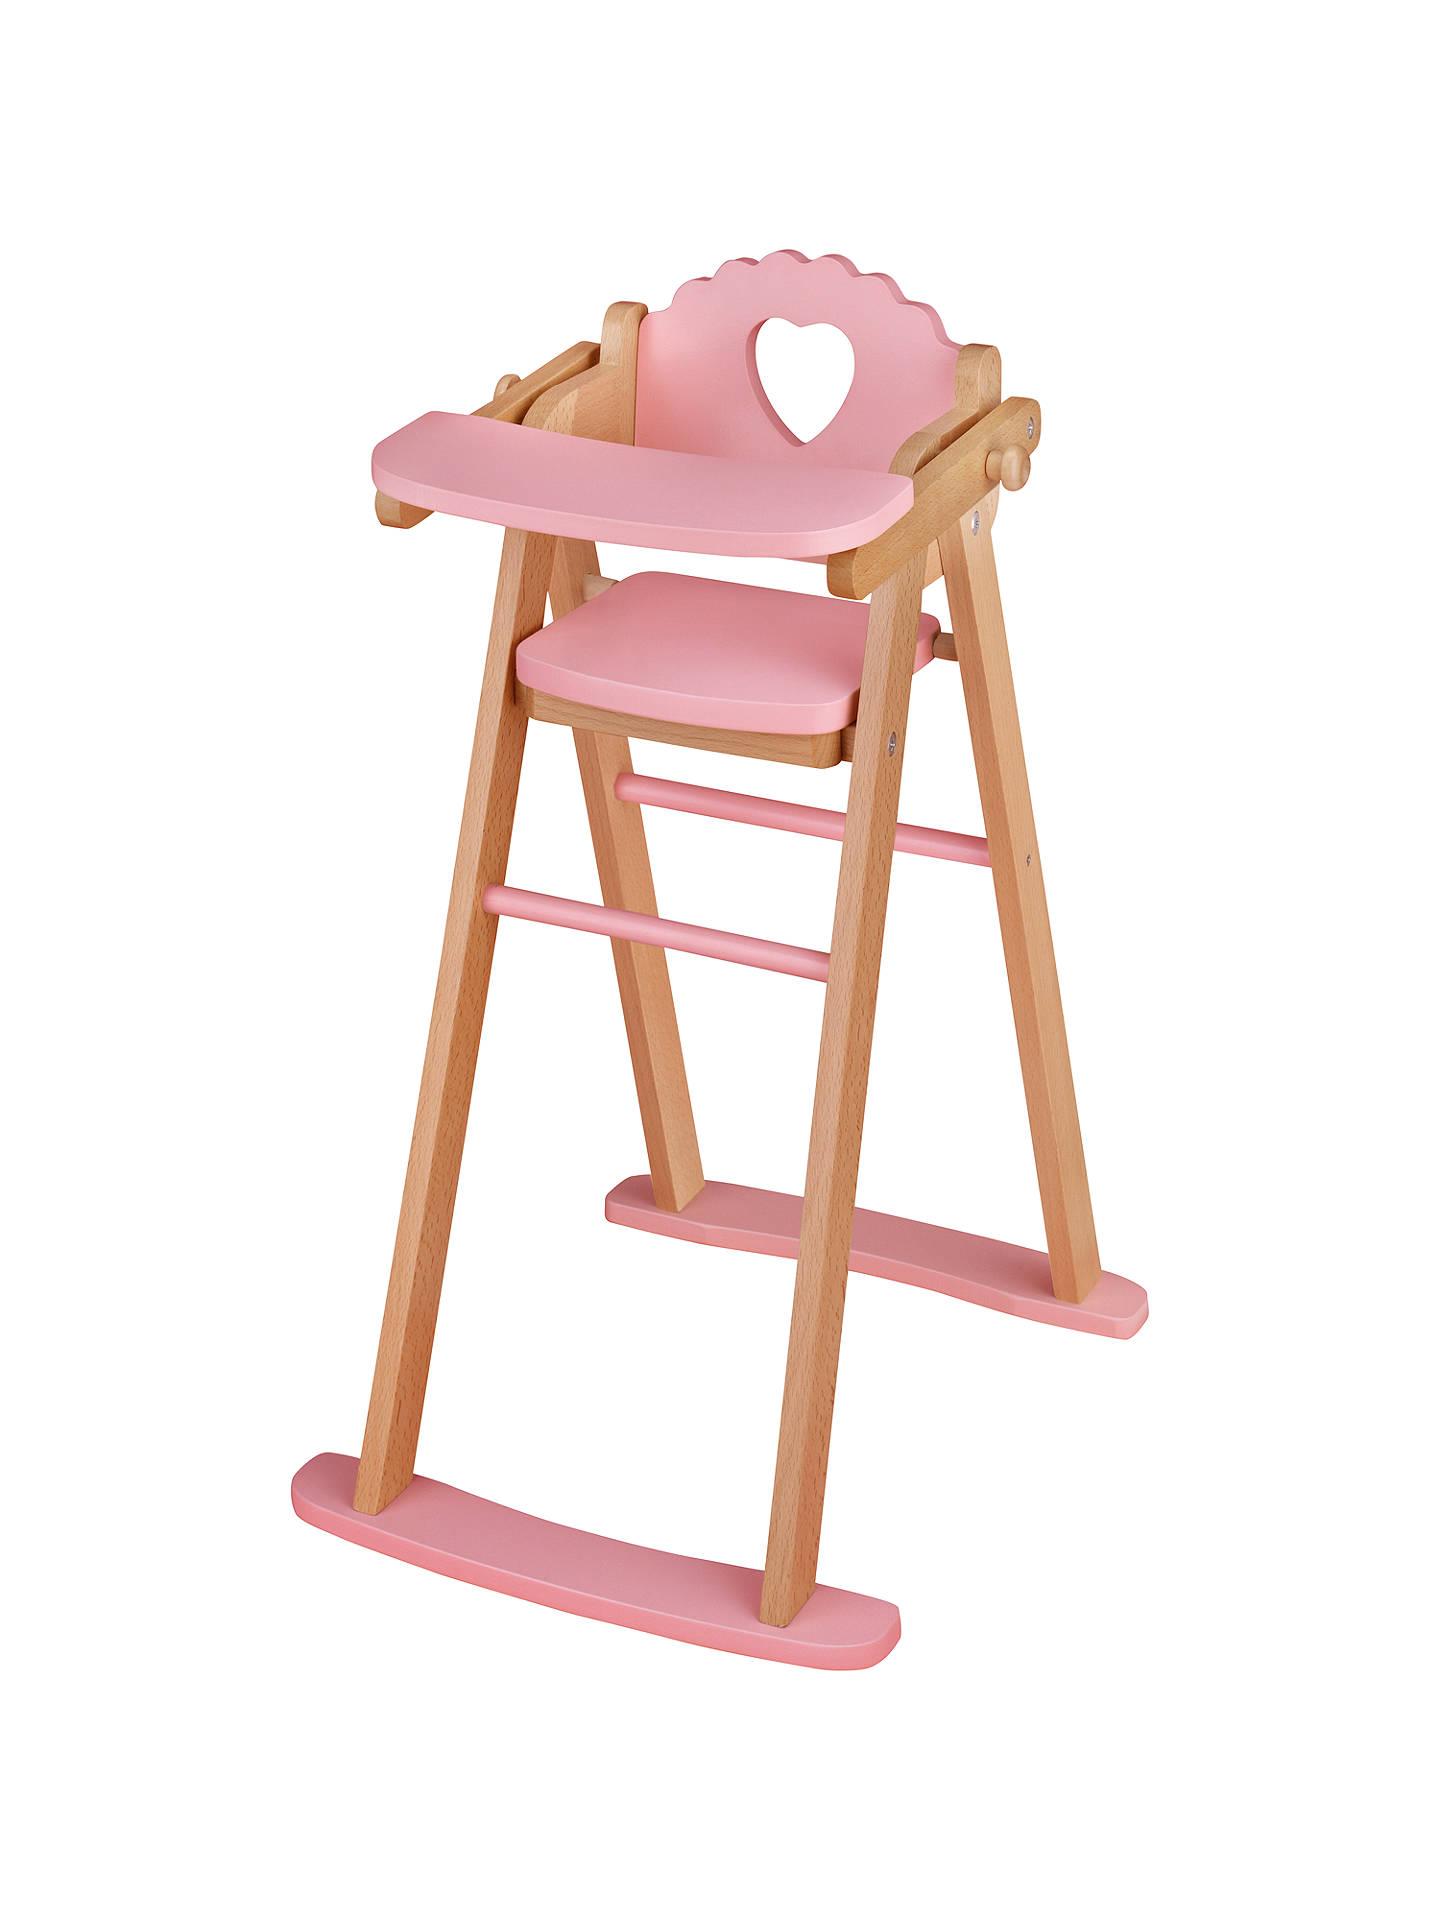 john lewis & partners doll's highchair